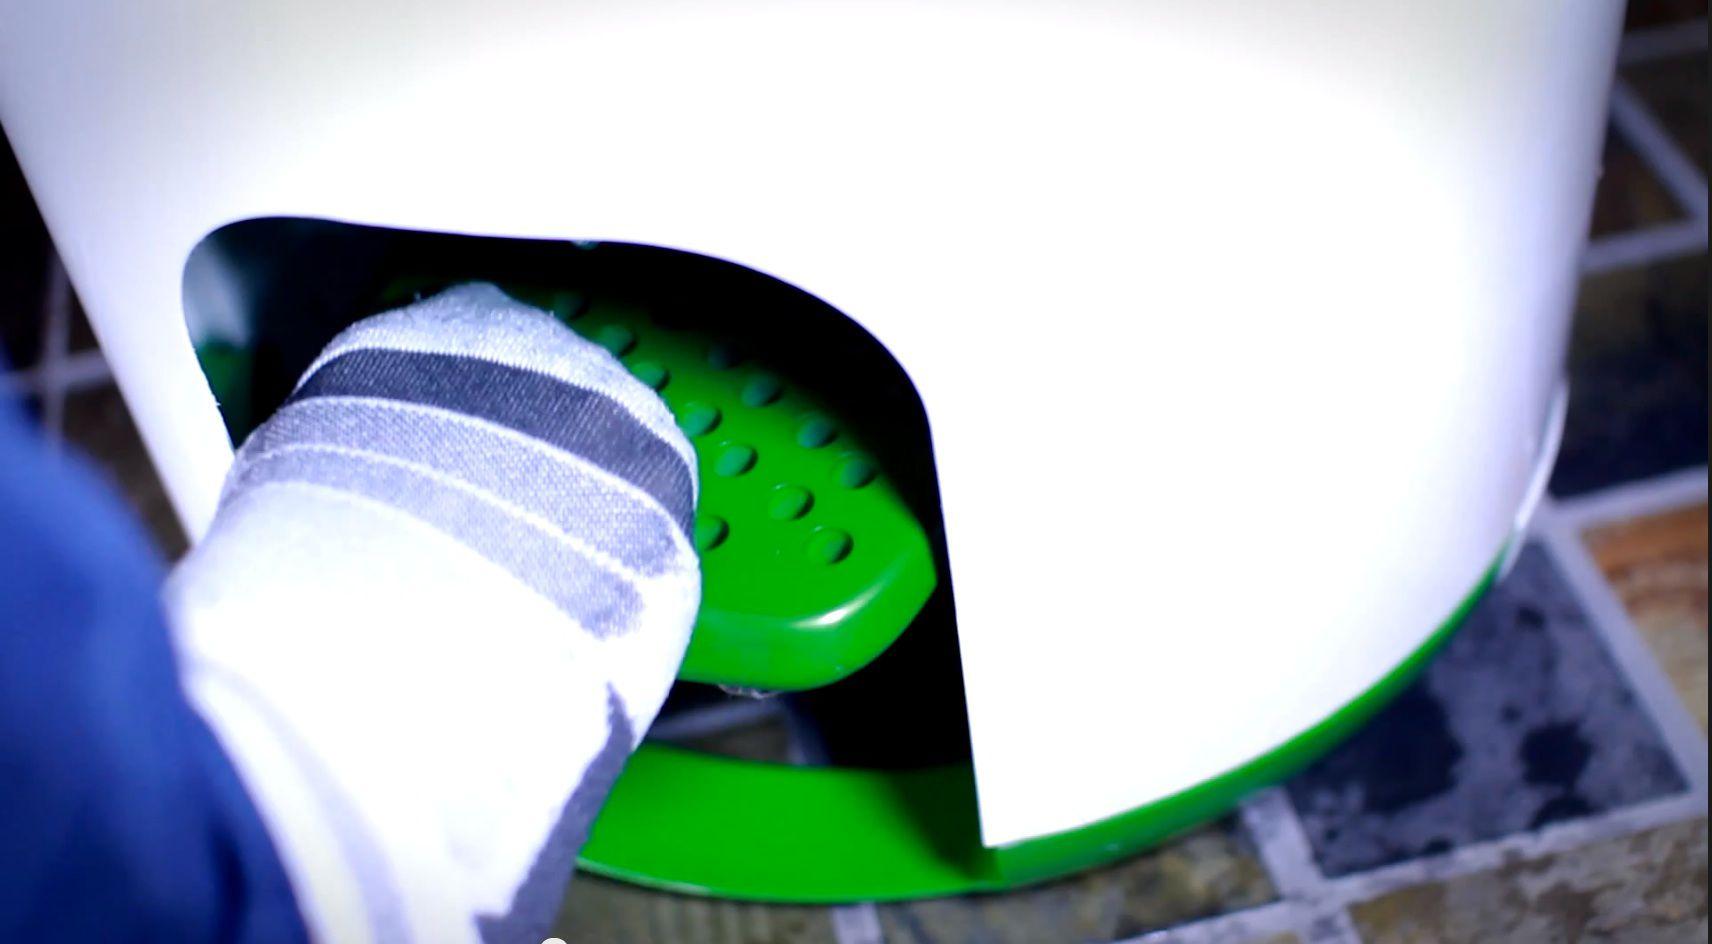 yirego foot pedal